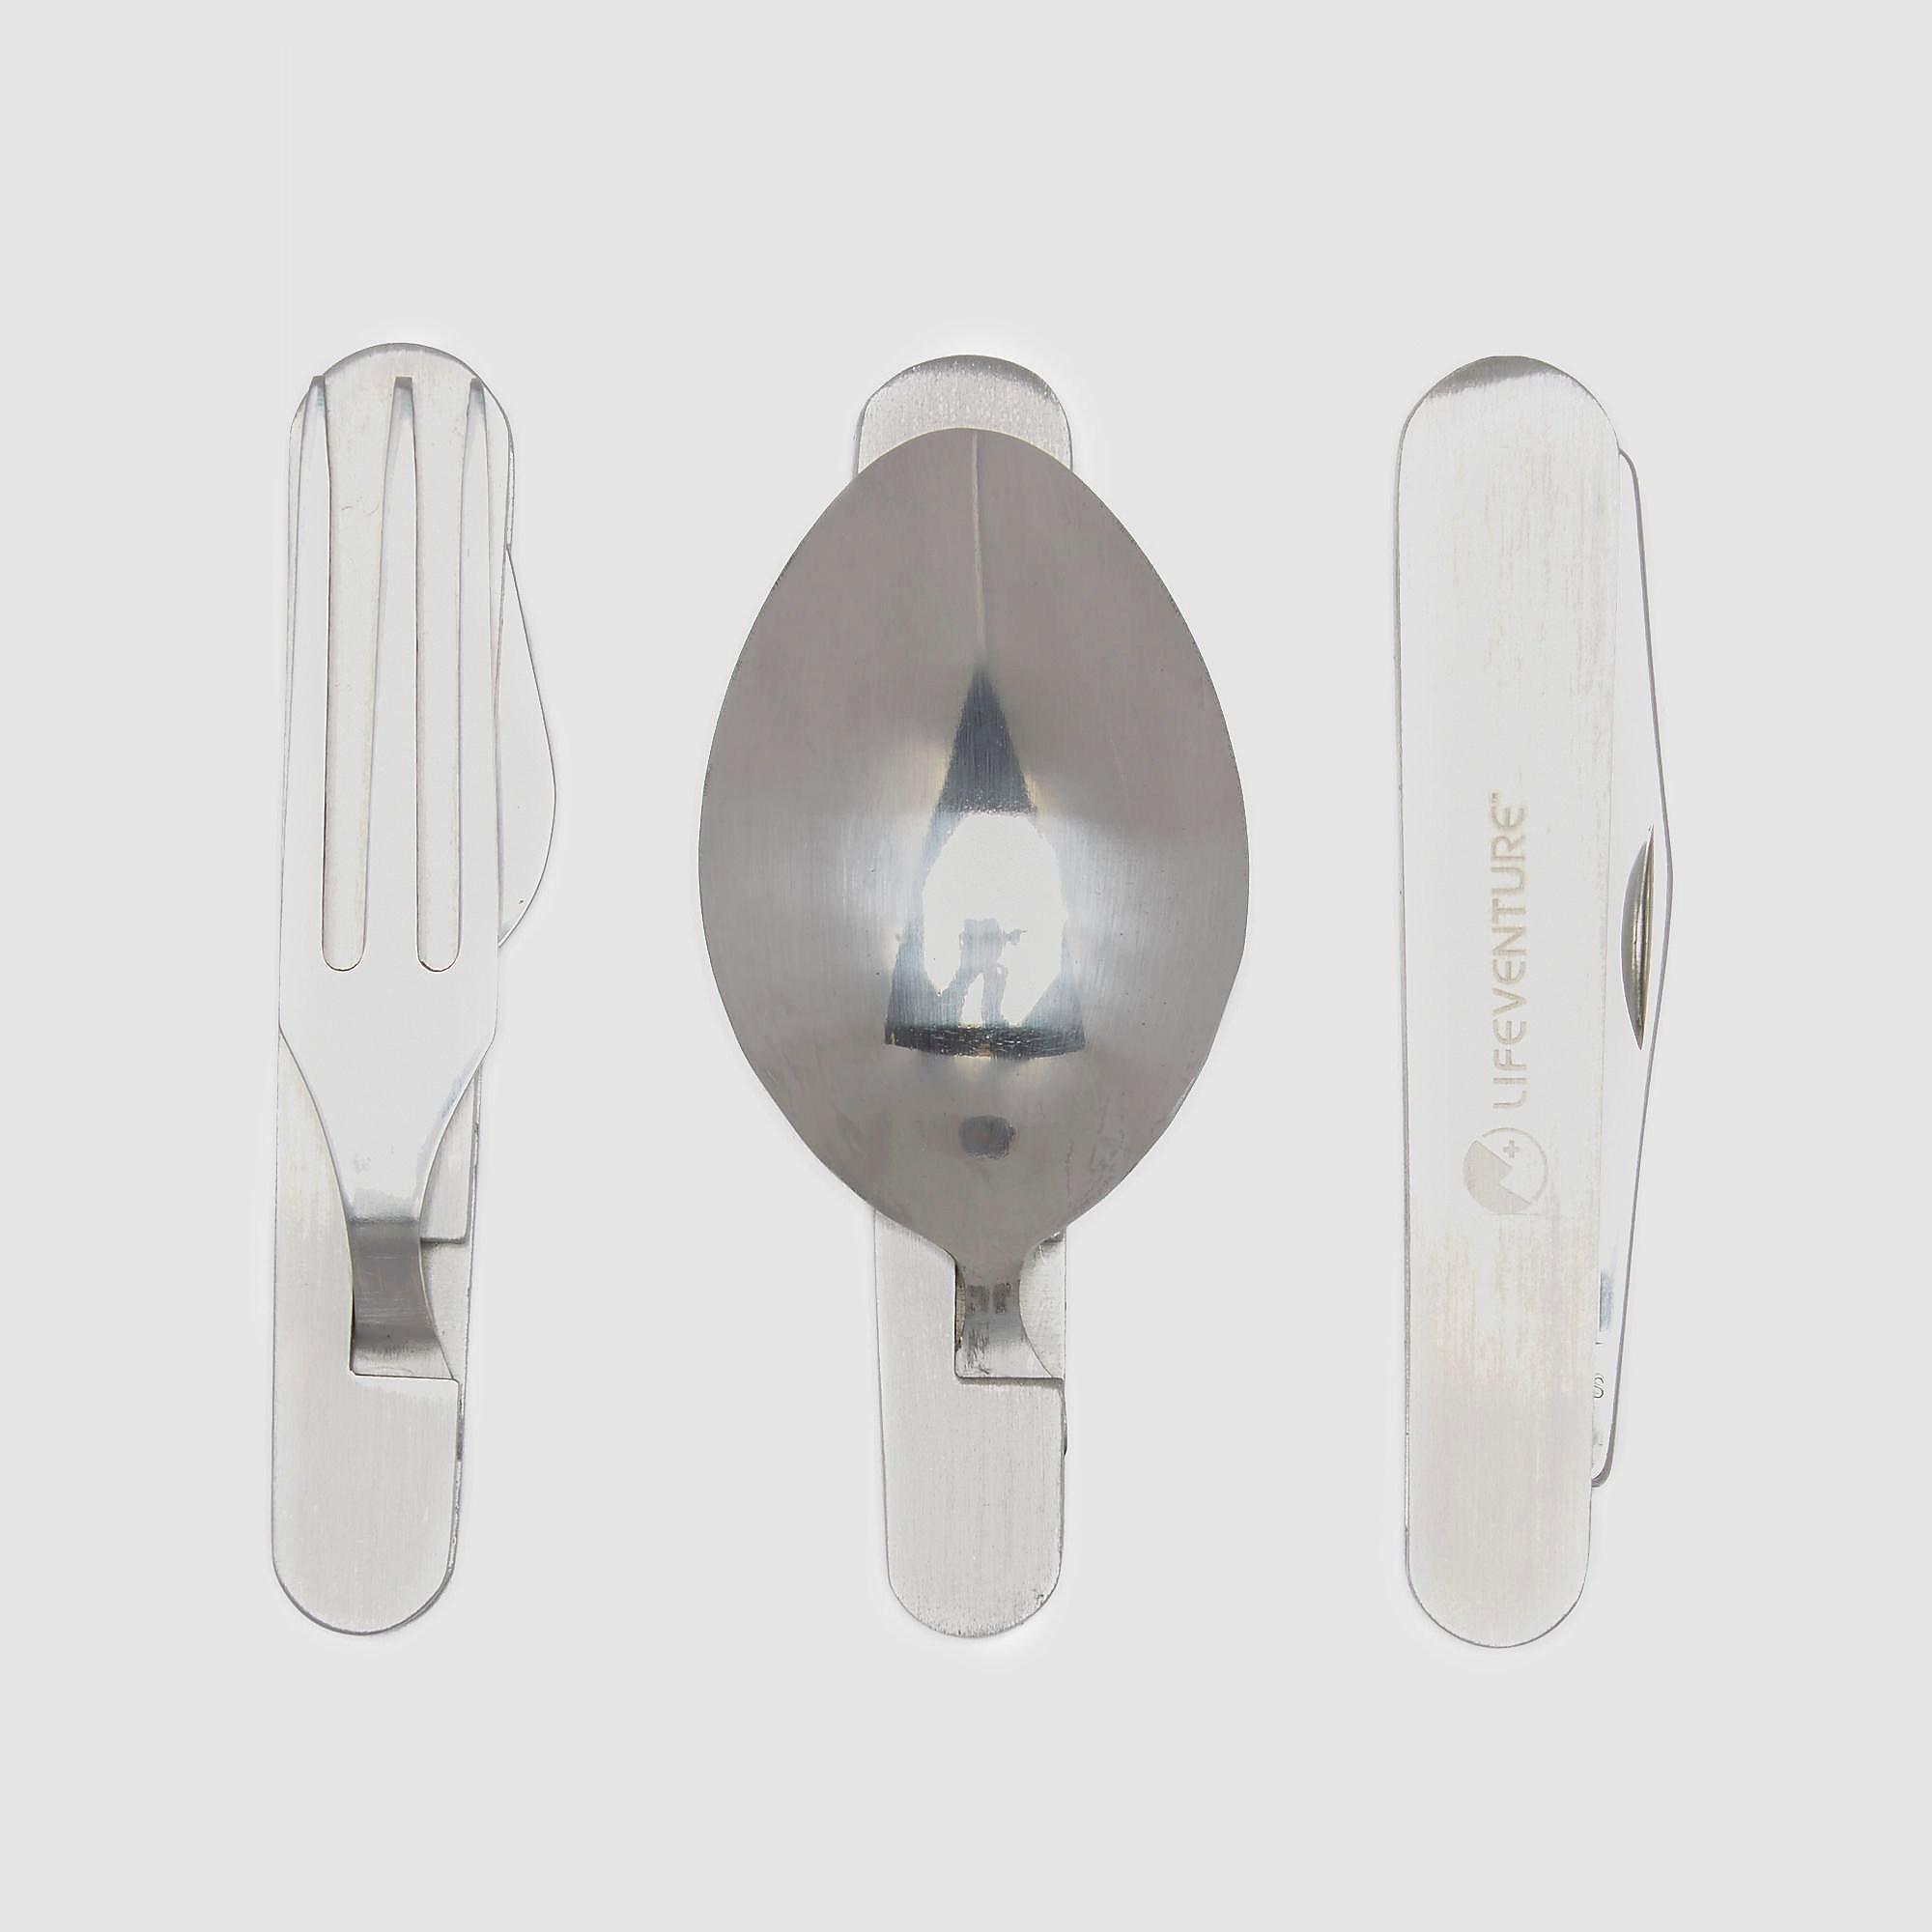 Life Systems Knife, Fork, Spoon - Folding Cutlery Set